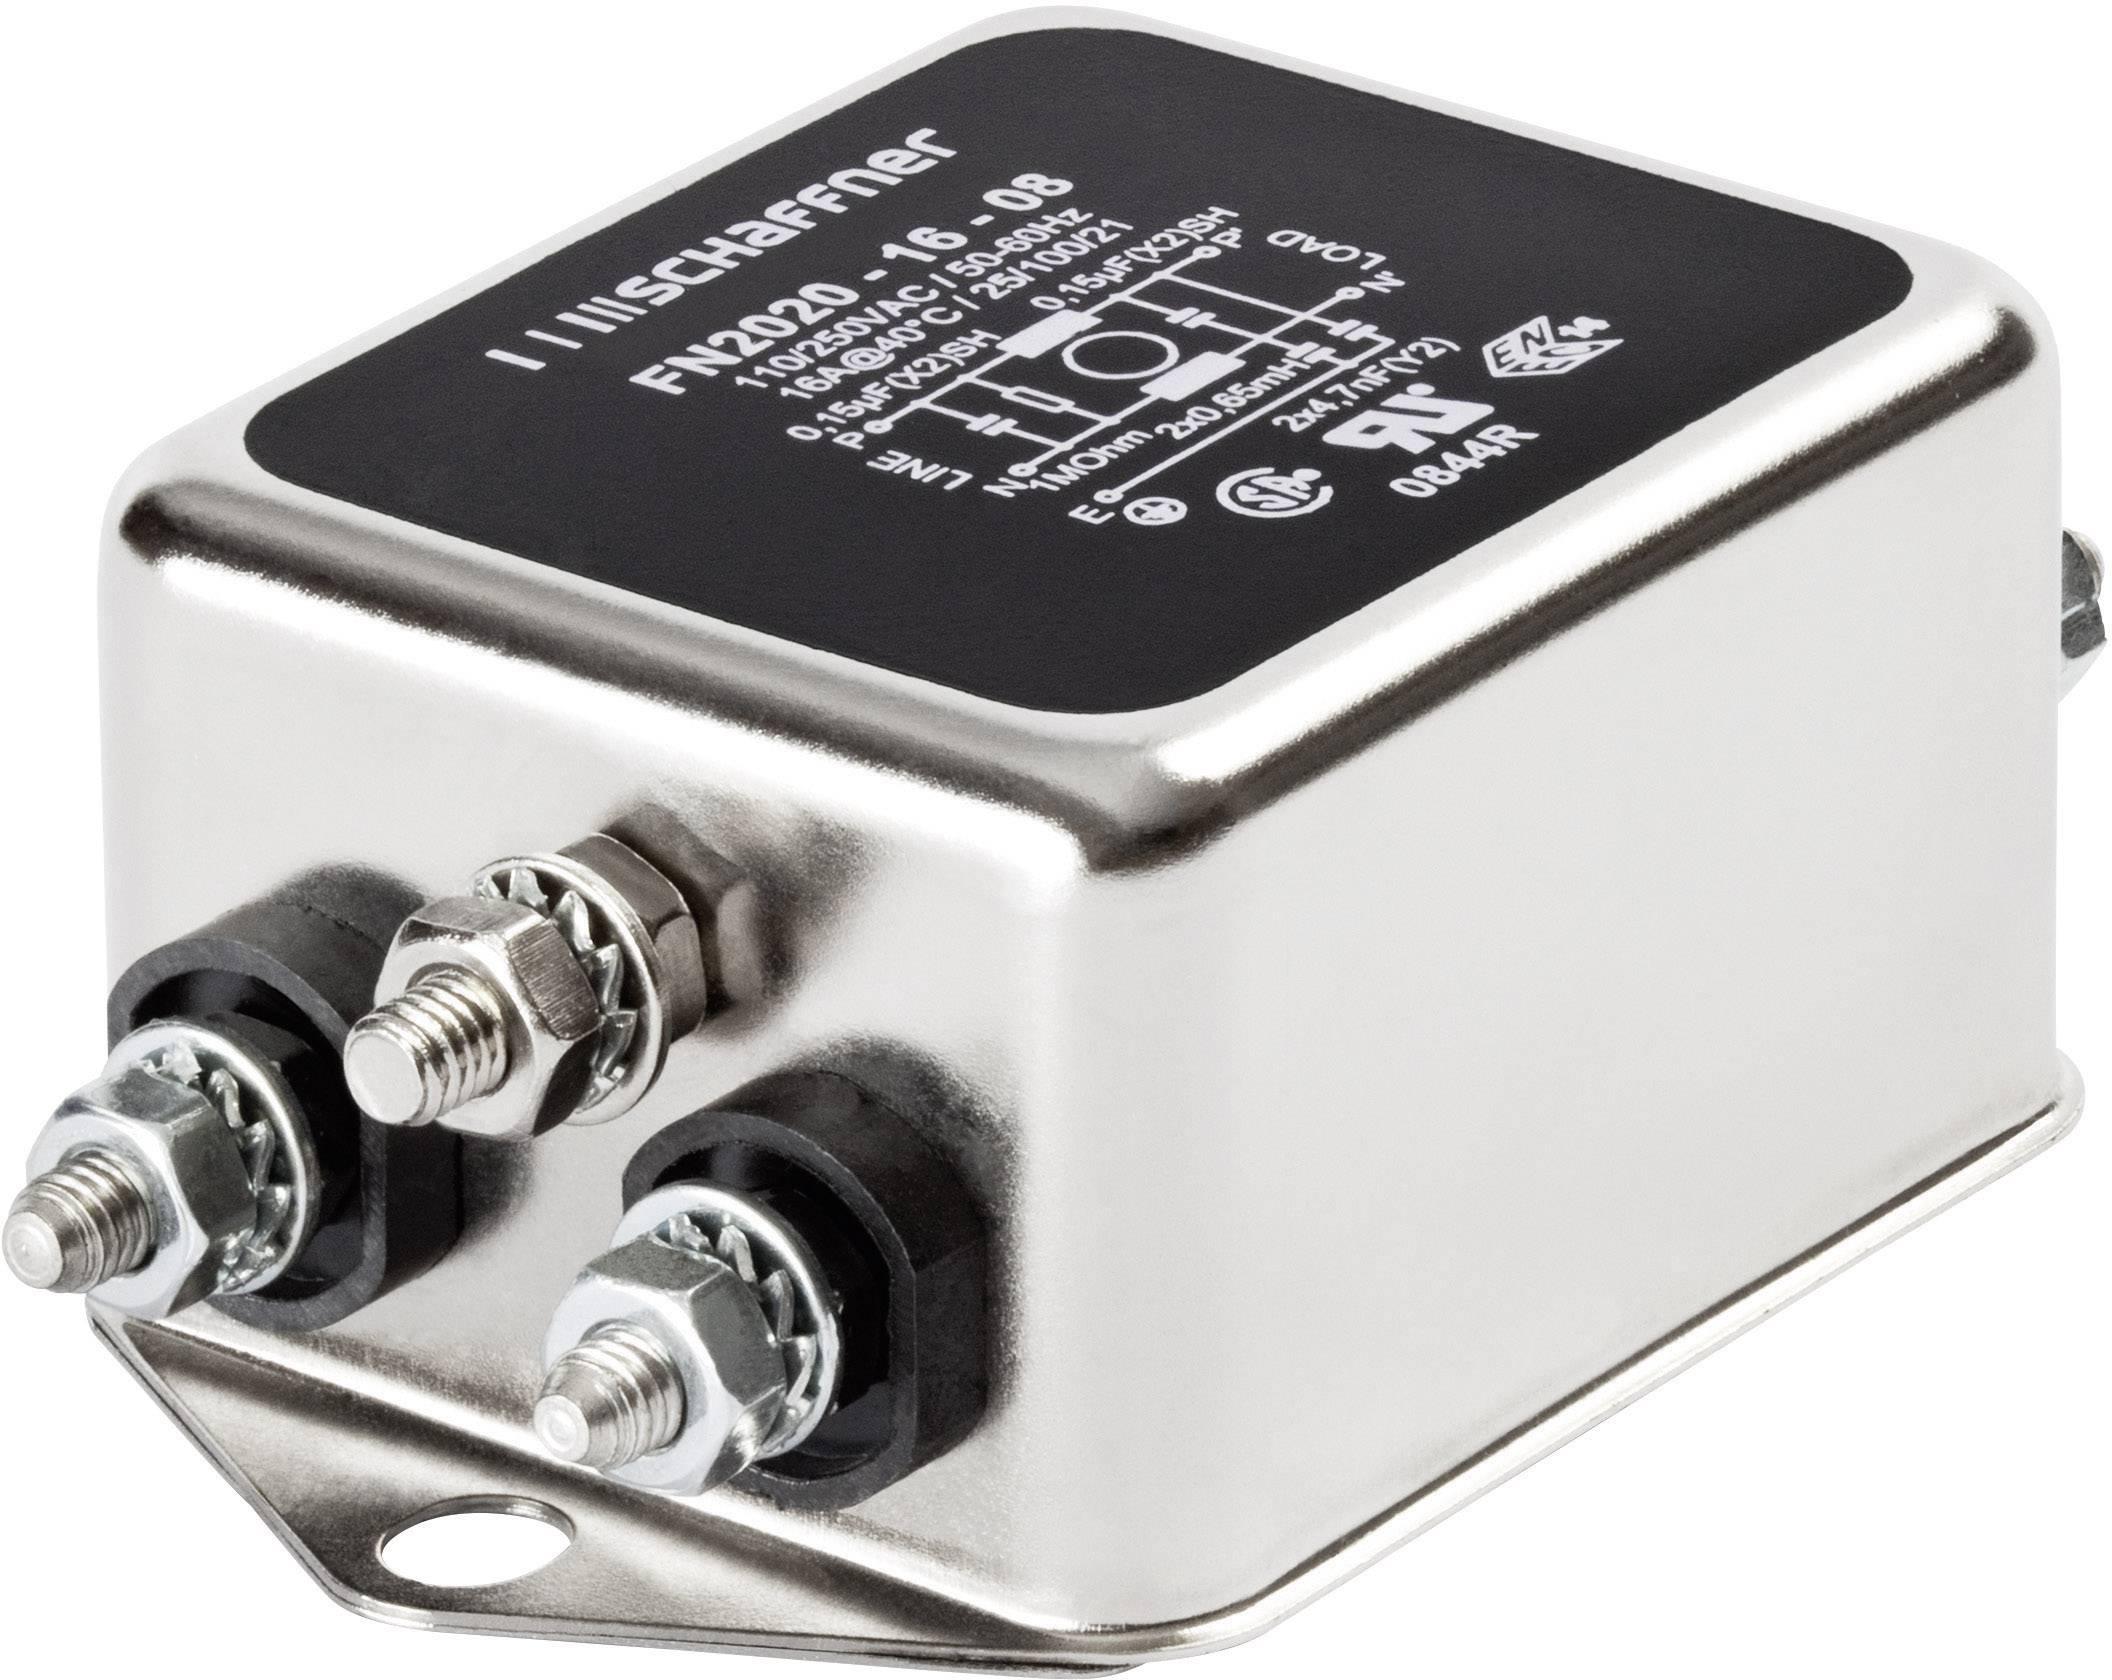 Odrušovací filter Schaffner FN 2020-3-06 FN 2020-3-06, 250 V/AC, 3 A, 2.5 mH, (š x v) 64 mm x 29.3 mm, 1 ks